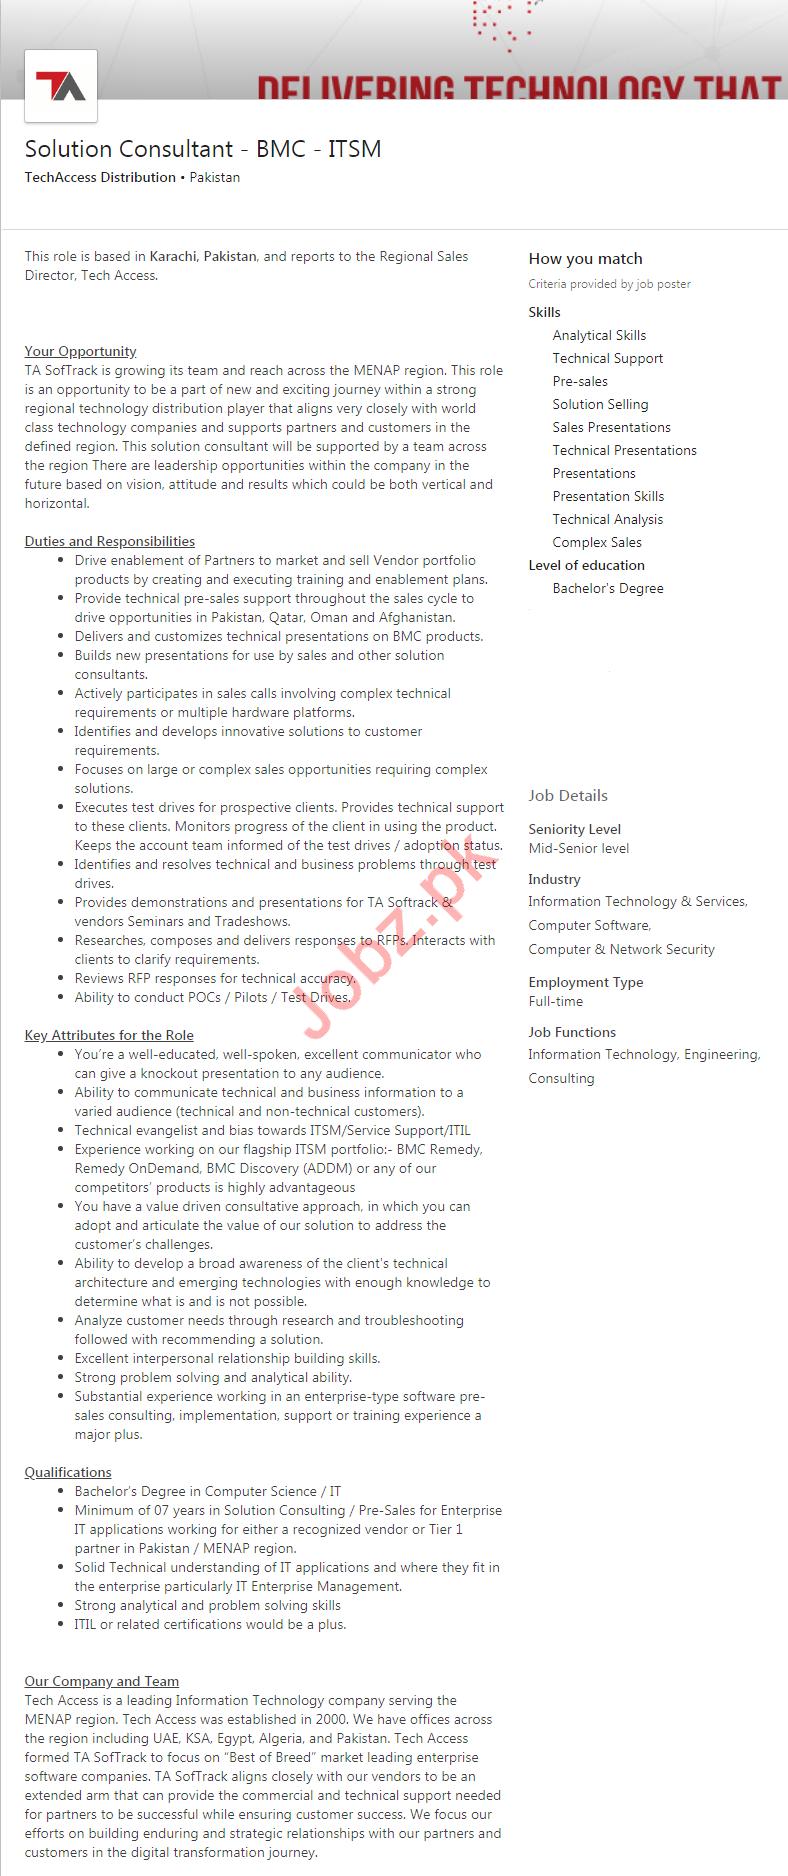 Solution Consultant Job 2019 in Karachi 2019 Job Advertisement Pakistan